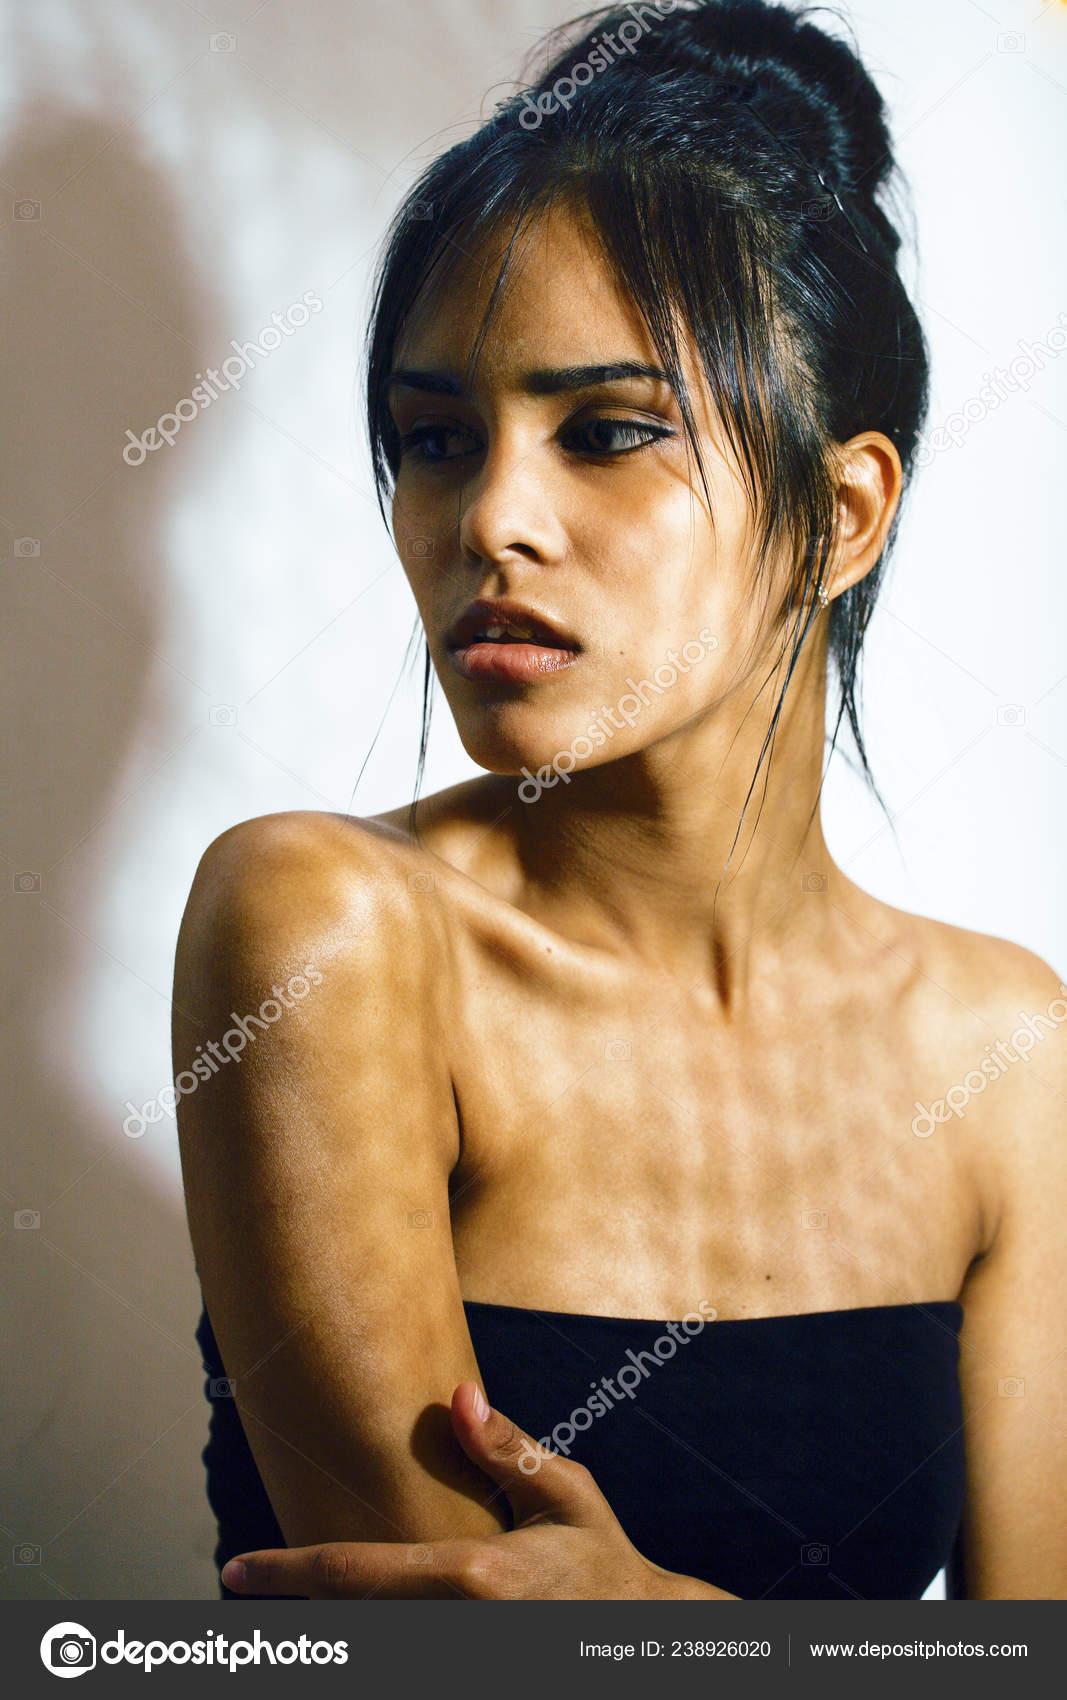 https://st4.depositphotos.com/2964705/23892/i/1600/depositphotos_238926020-stock-photo-beauty-latin-young-woman-in.jpg